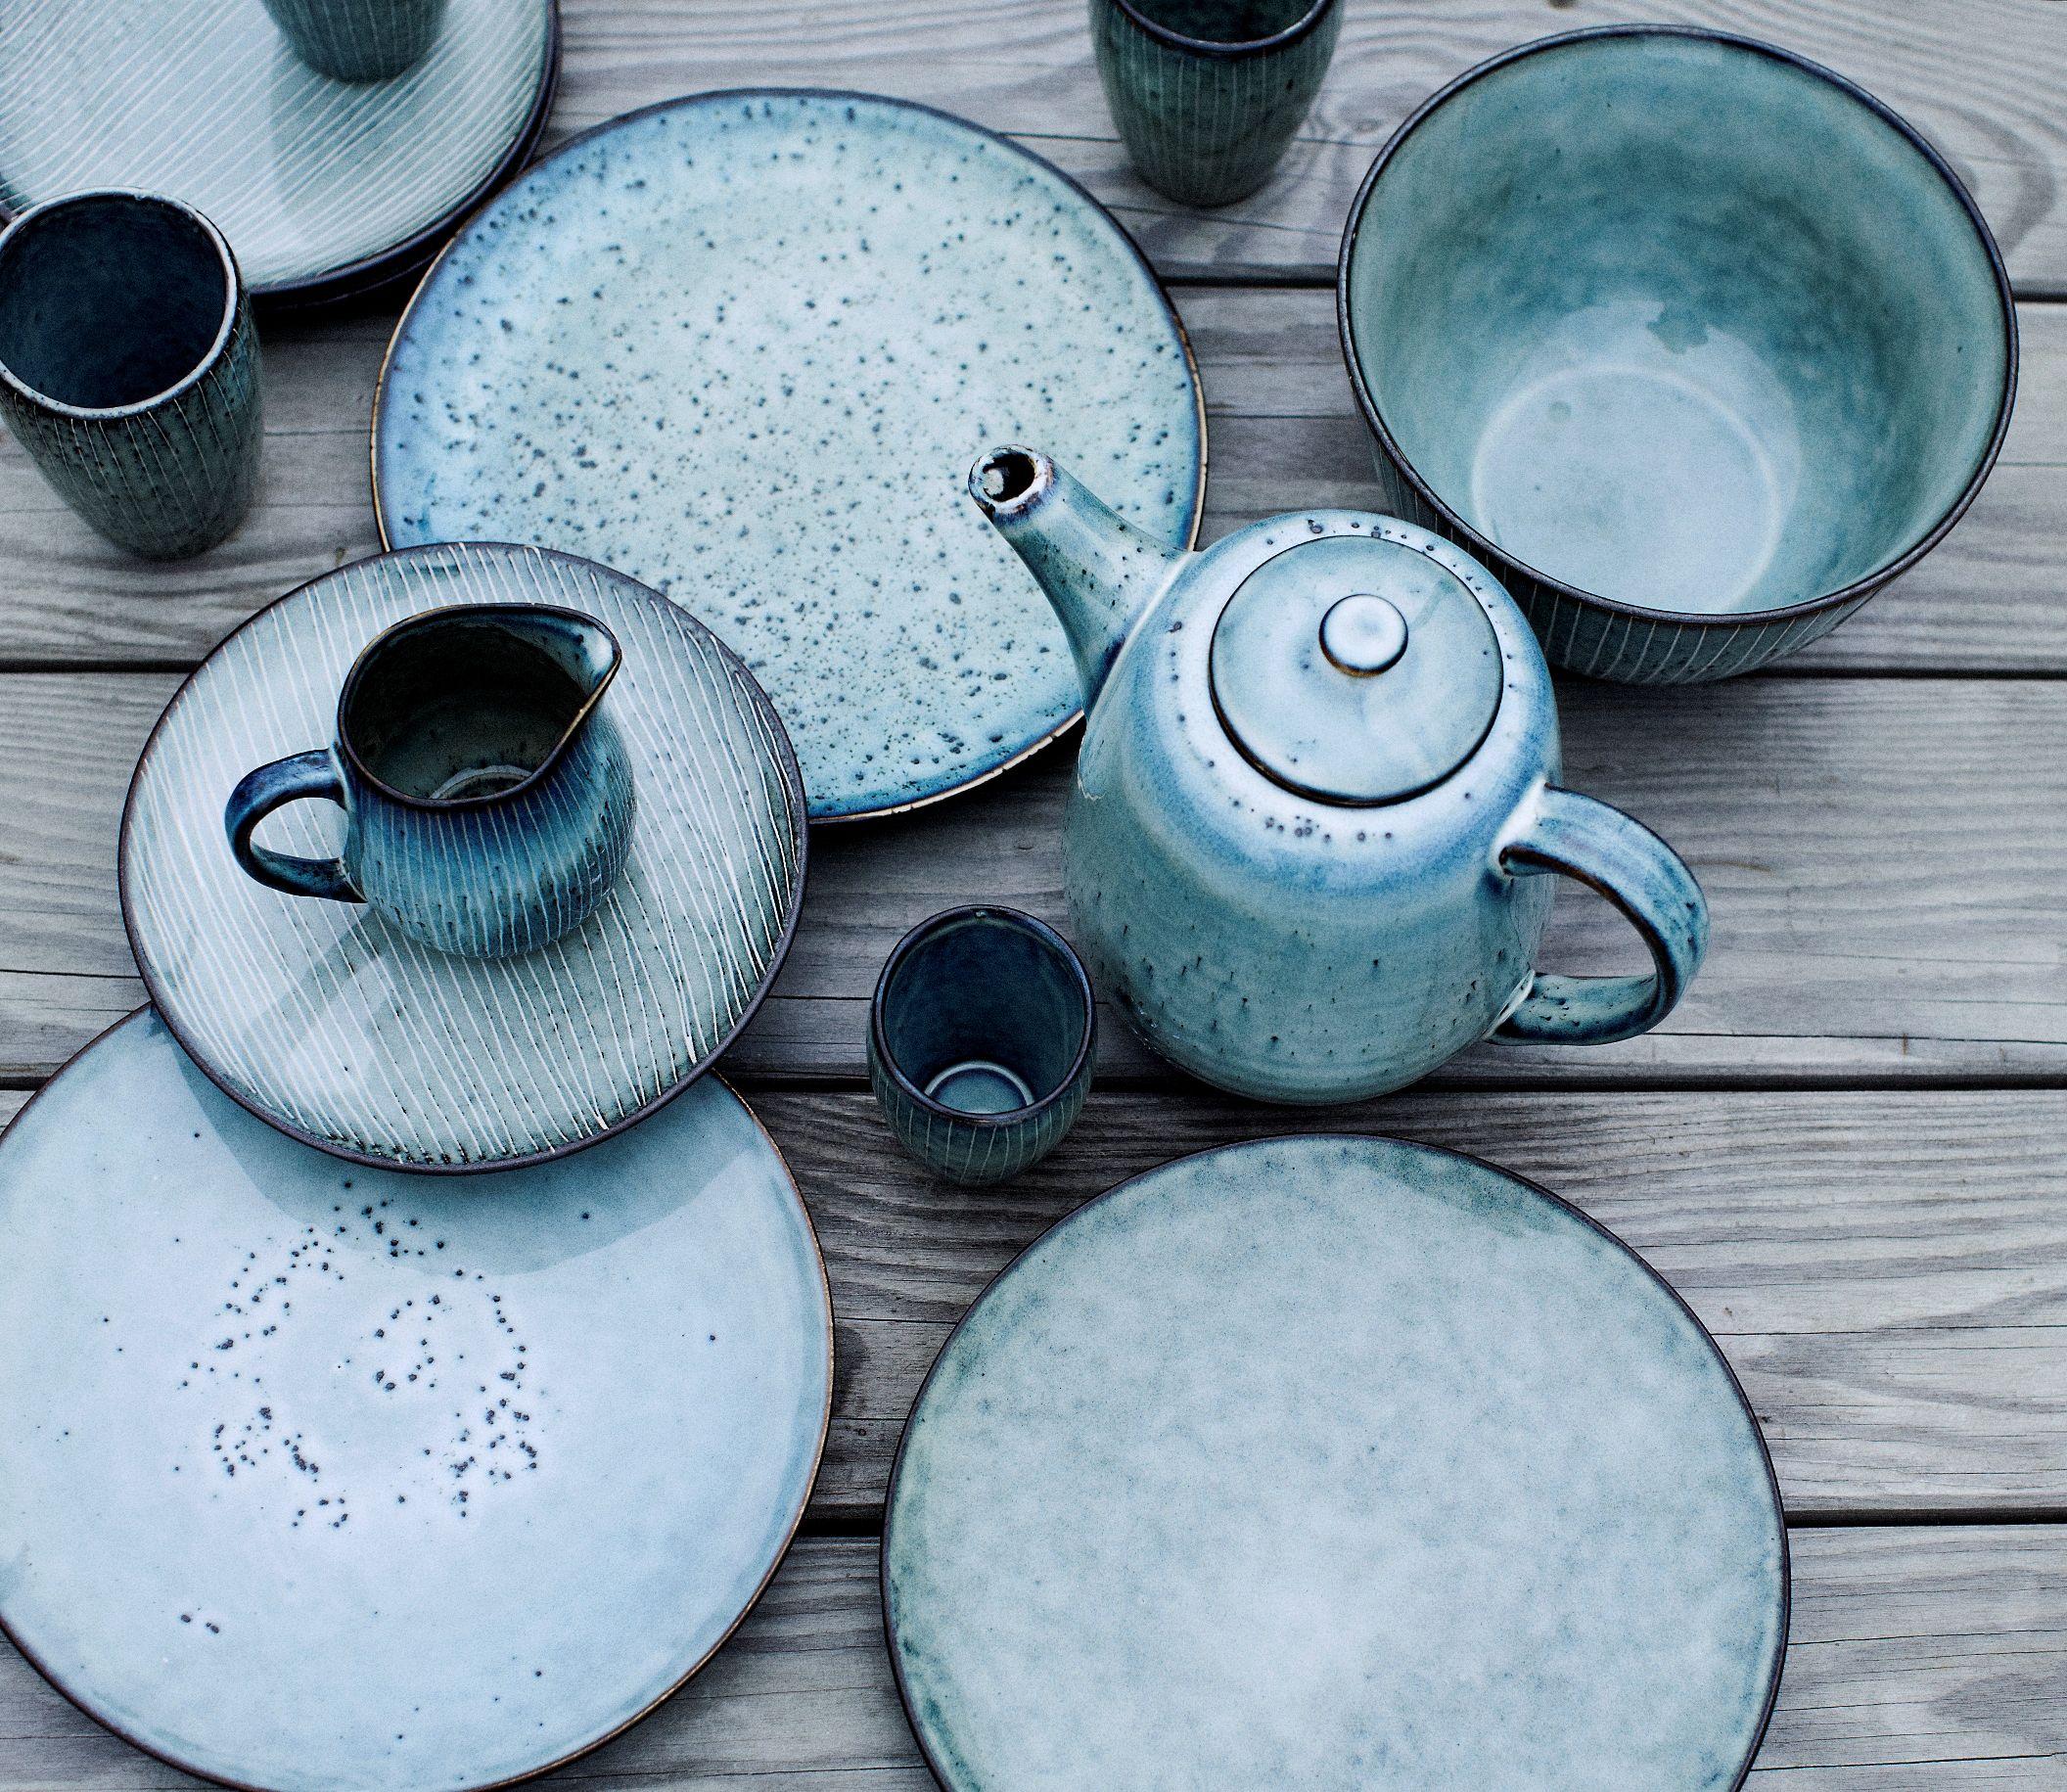 Nordic design ceramic tableware by broste copenhagen for Tisch nordic design